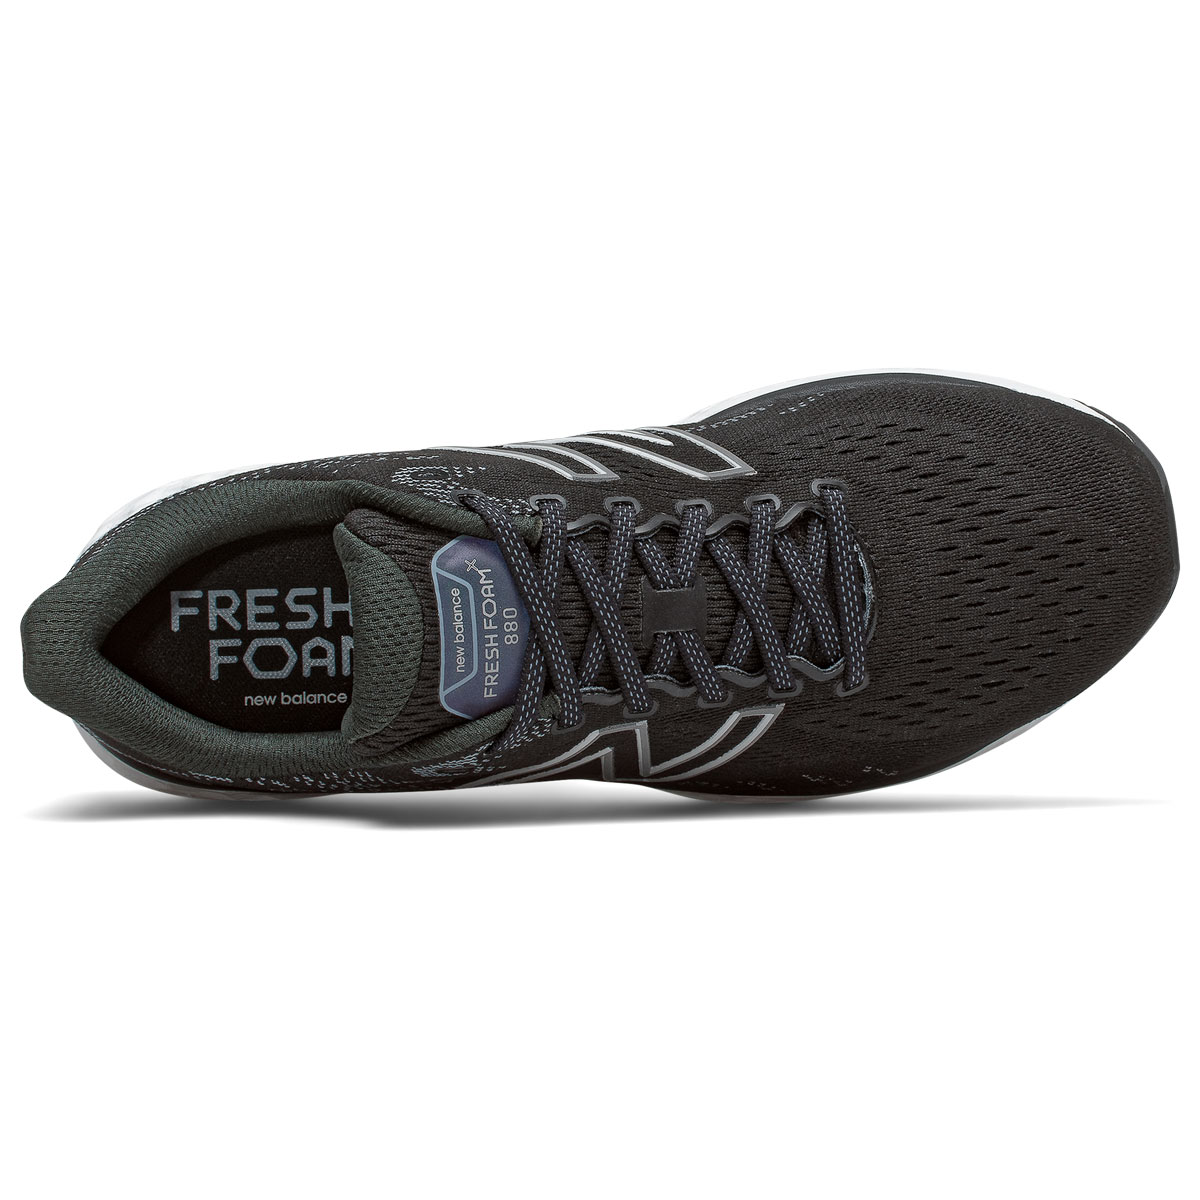 Men's New Balance Fresh Foam 880v11 Running Shoe - Color: Black/Cyclone - Size: 6 - Width: Wide, Black/Cyclone, large, image 3